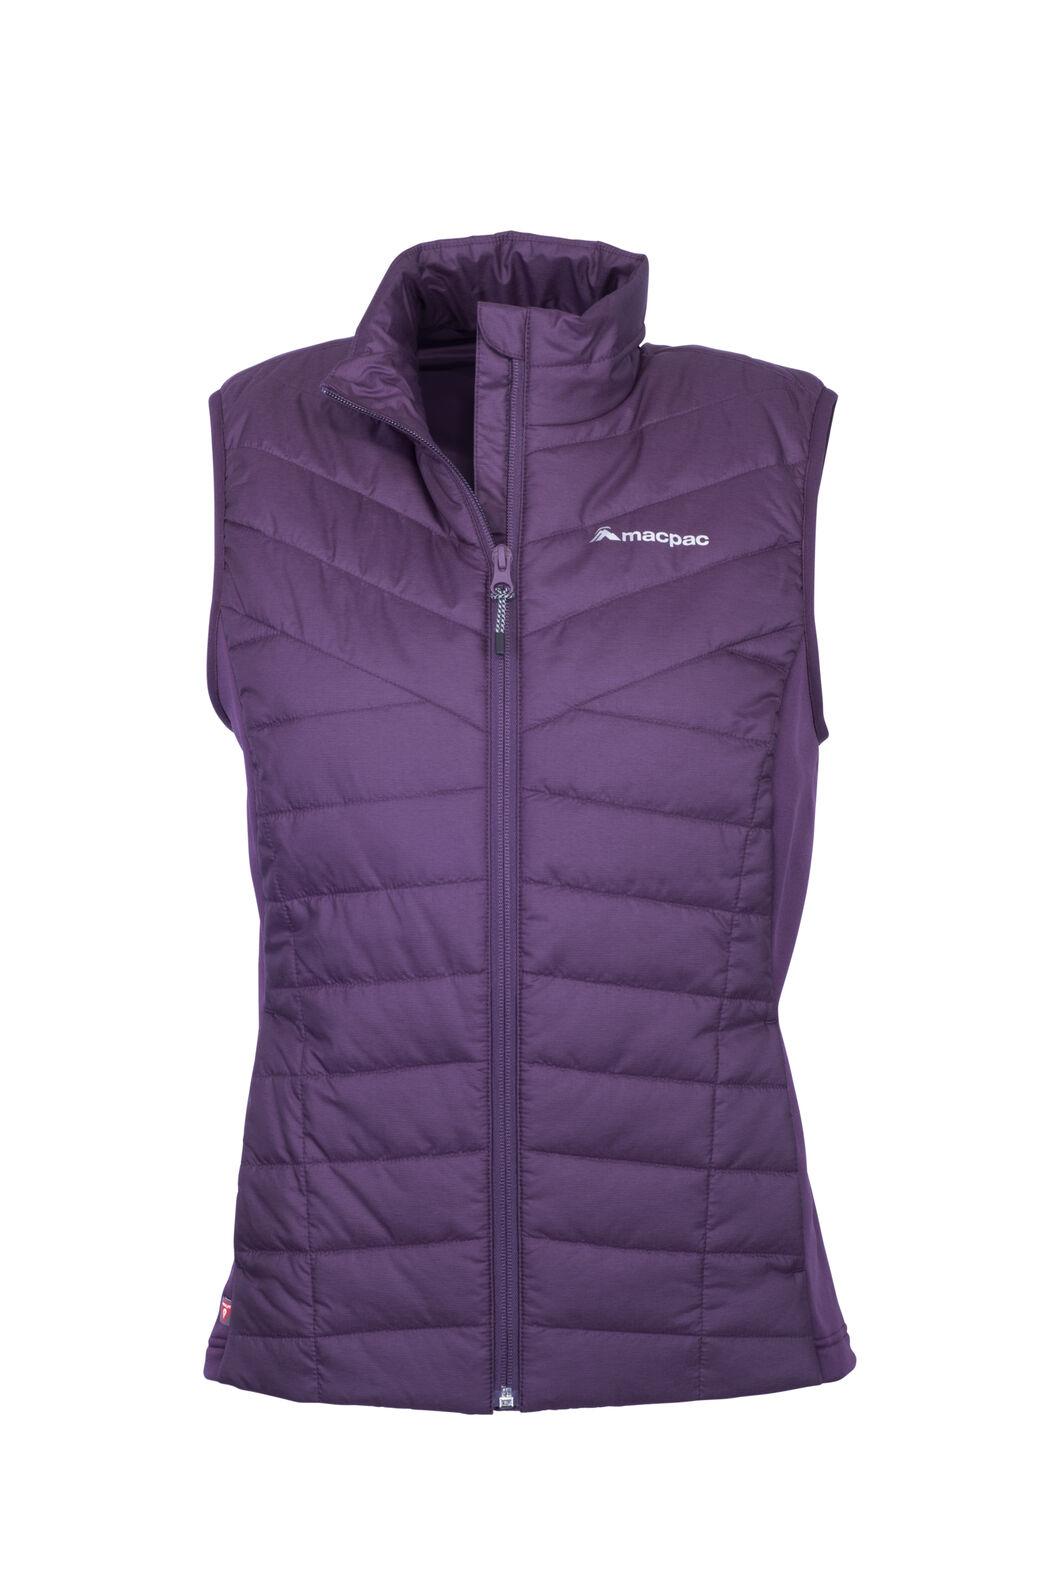 Macpac Strider Hybrid PrimaLoft® Vest — Women's, Blackberry Wine, hi-res